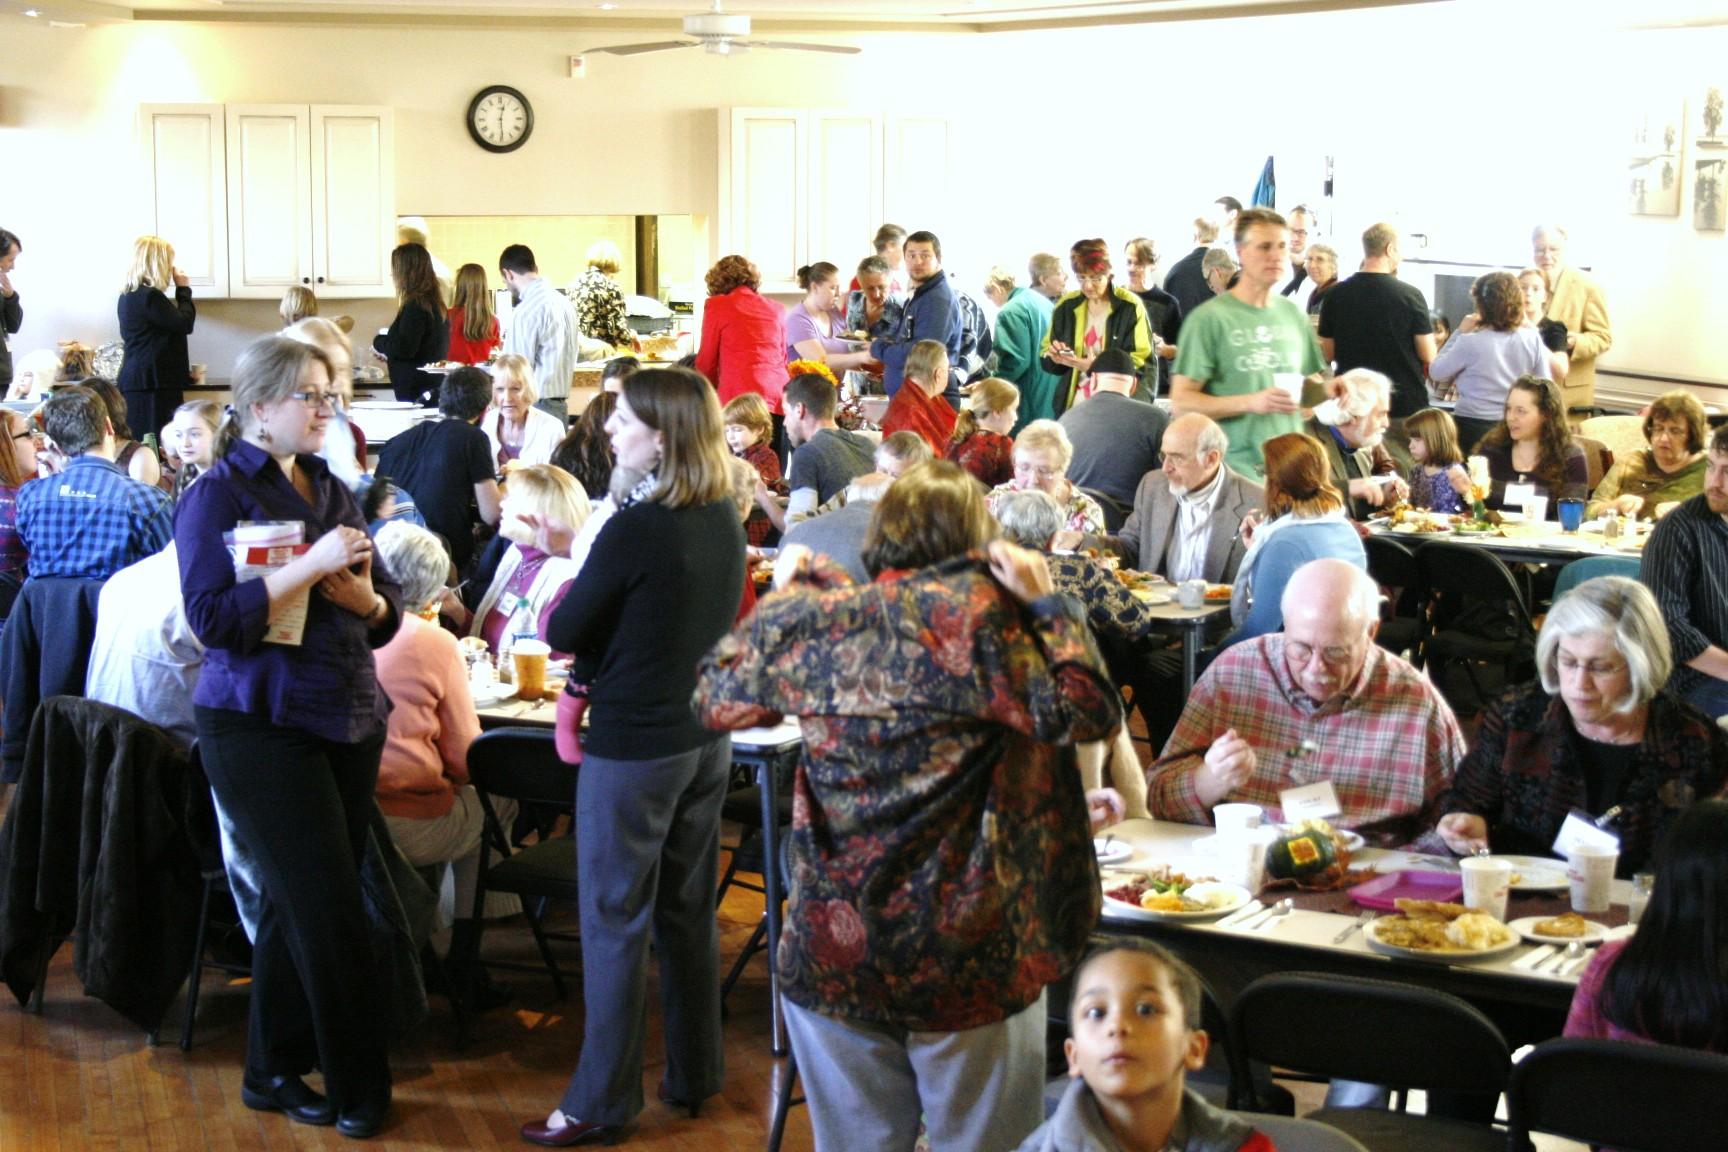 thanksgiving crowd